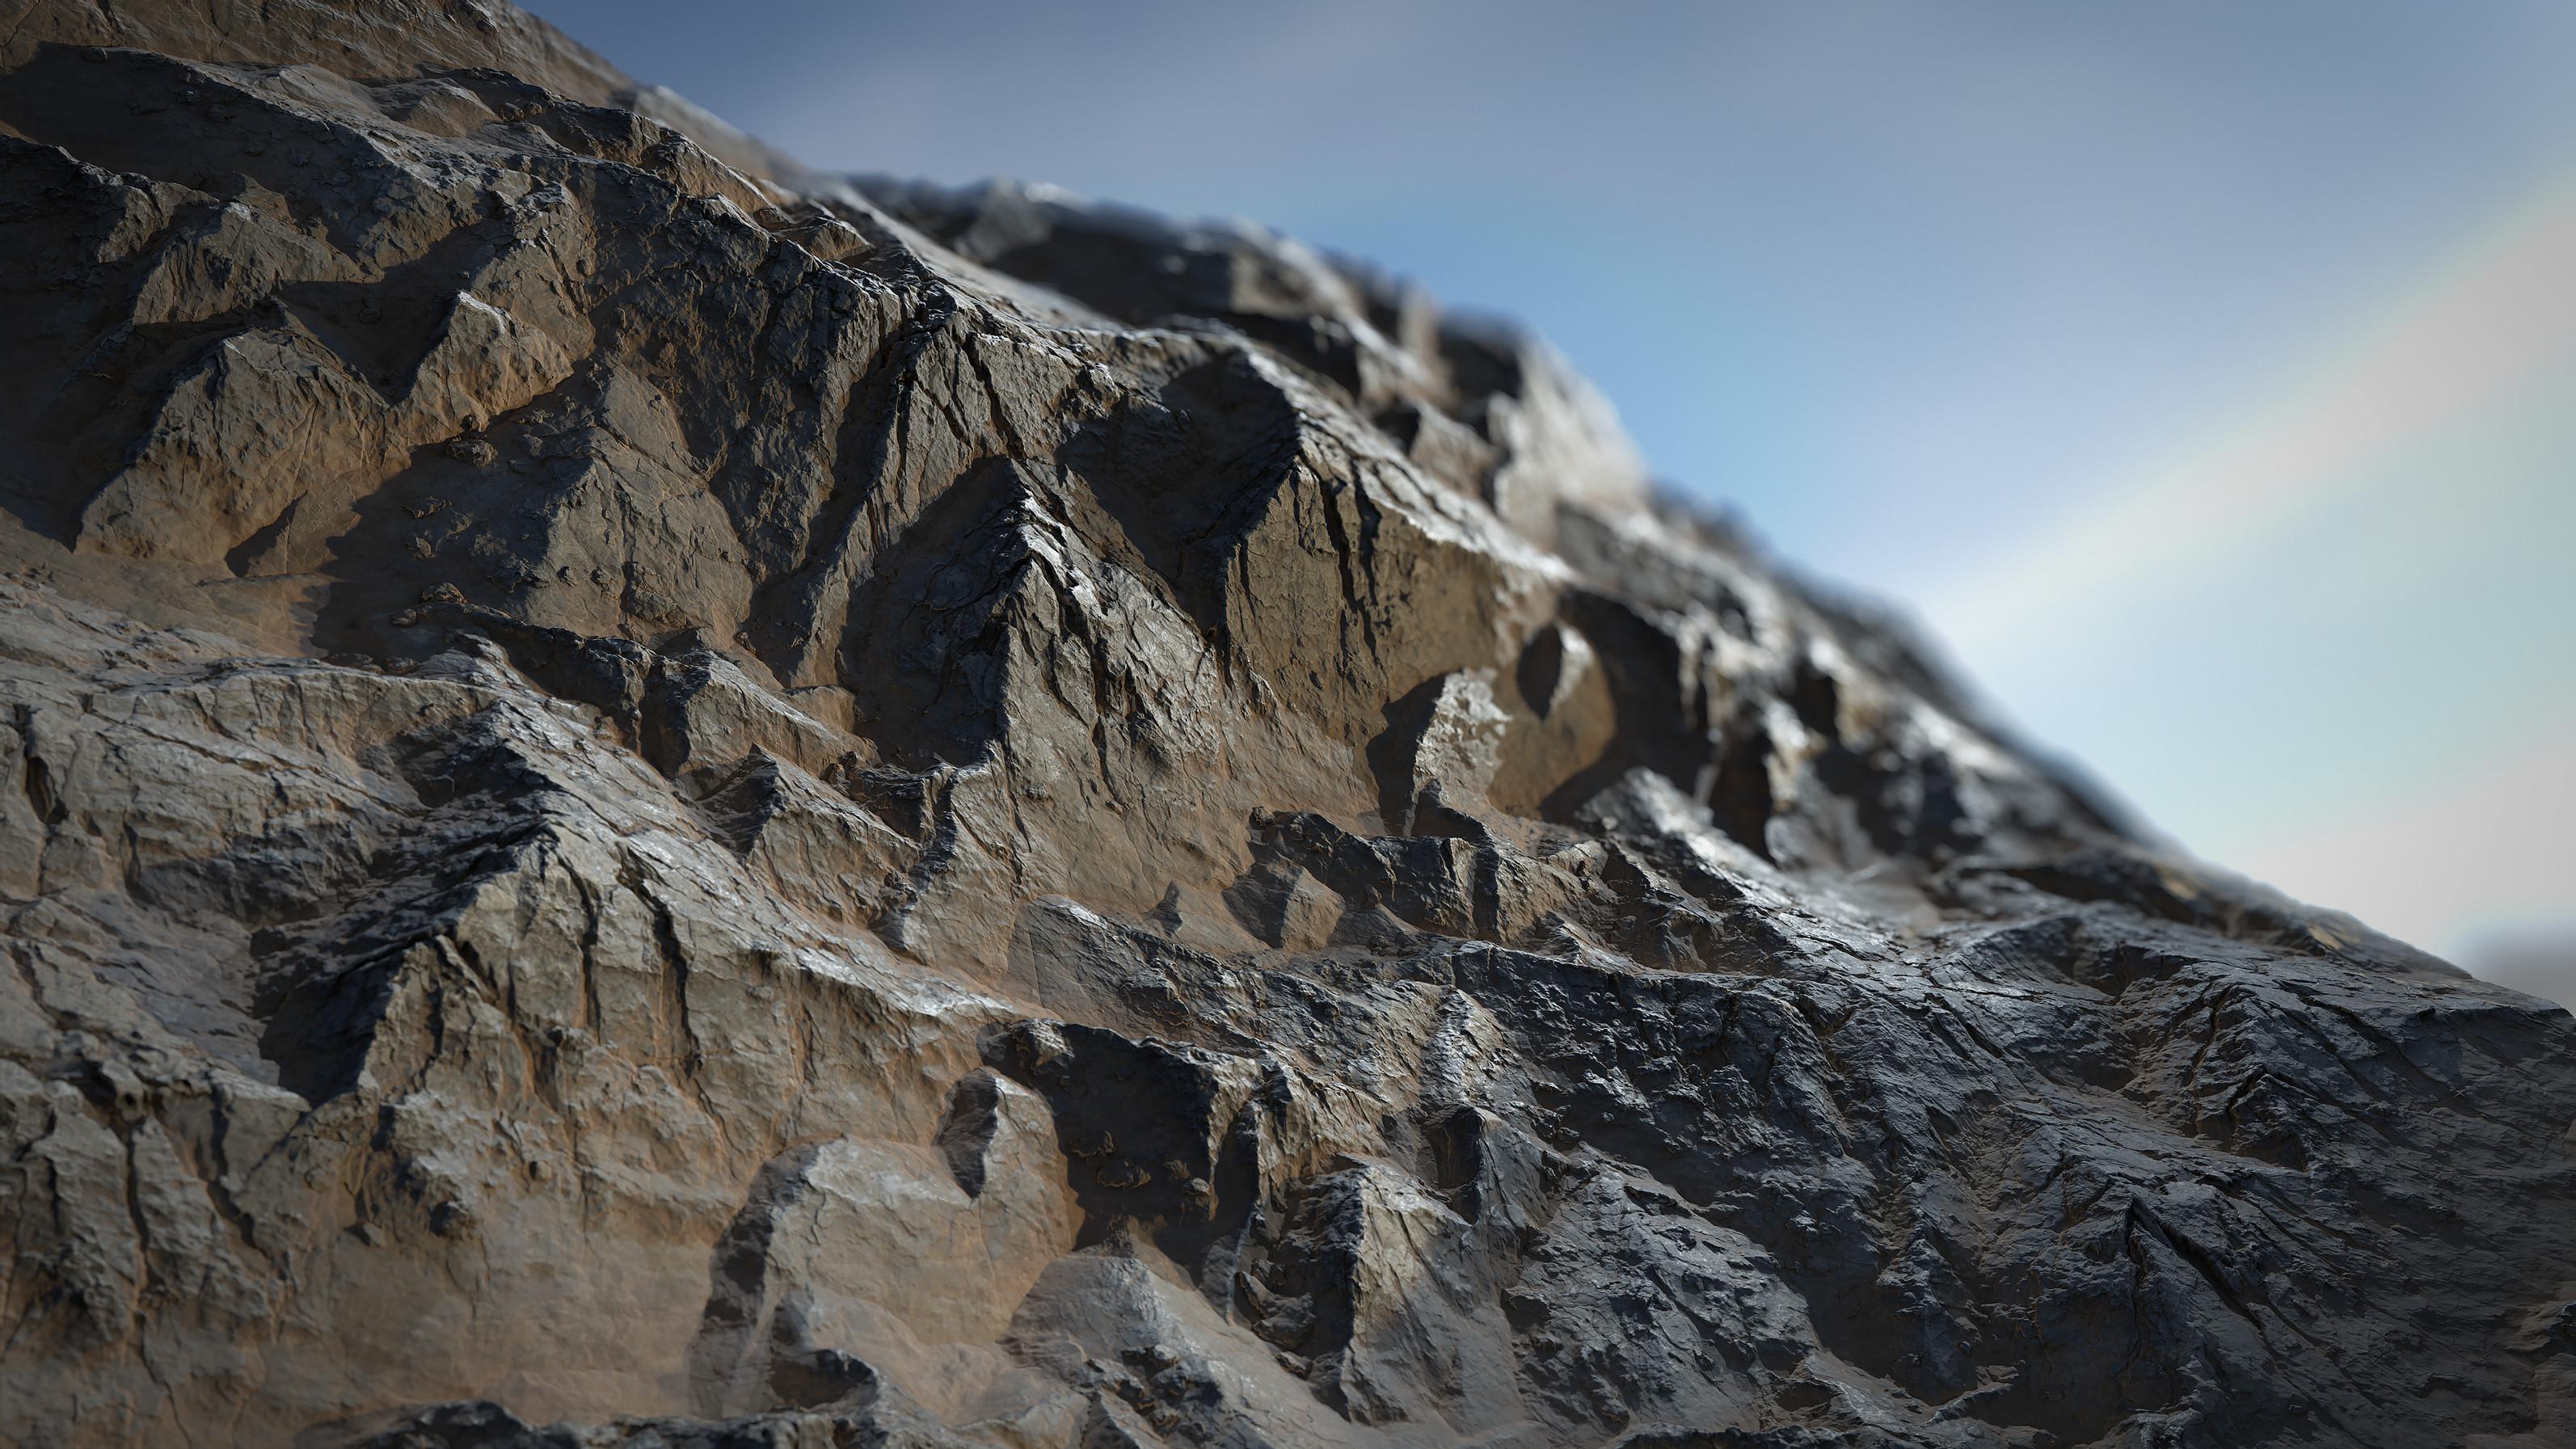 Alternate scene rendered in Marmoset Toolbag 4